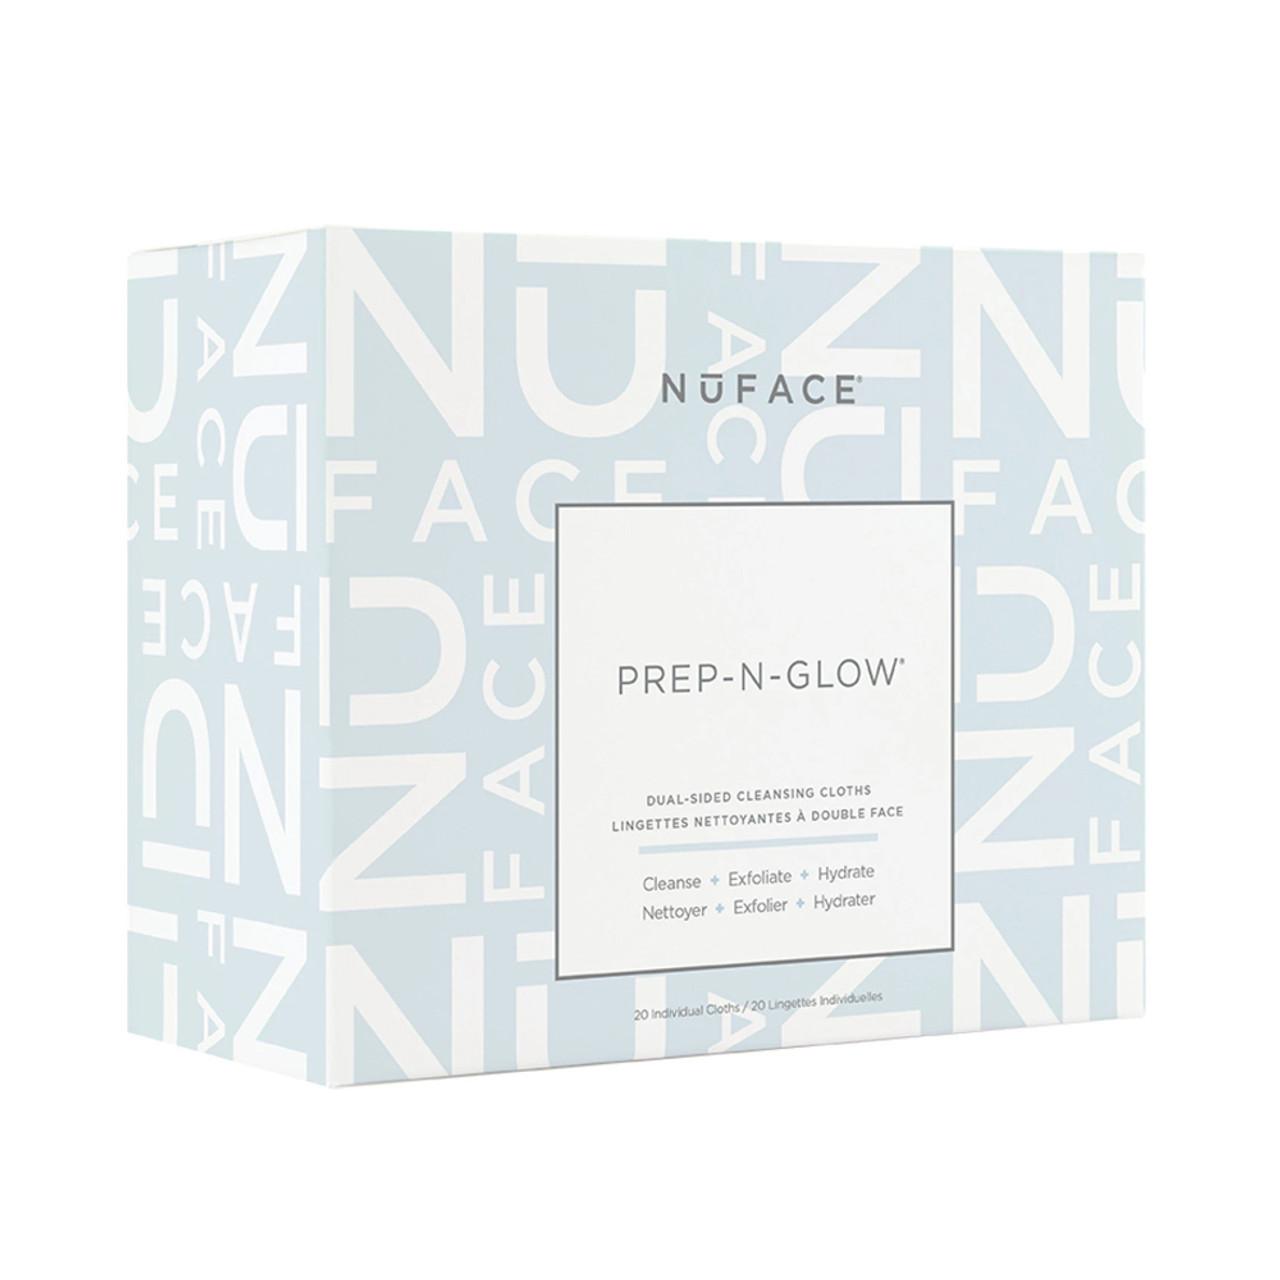 NuFACE Prep-N-Glow Cleansing Cloths (20-Pk)